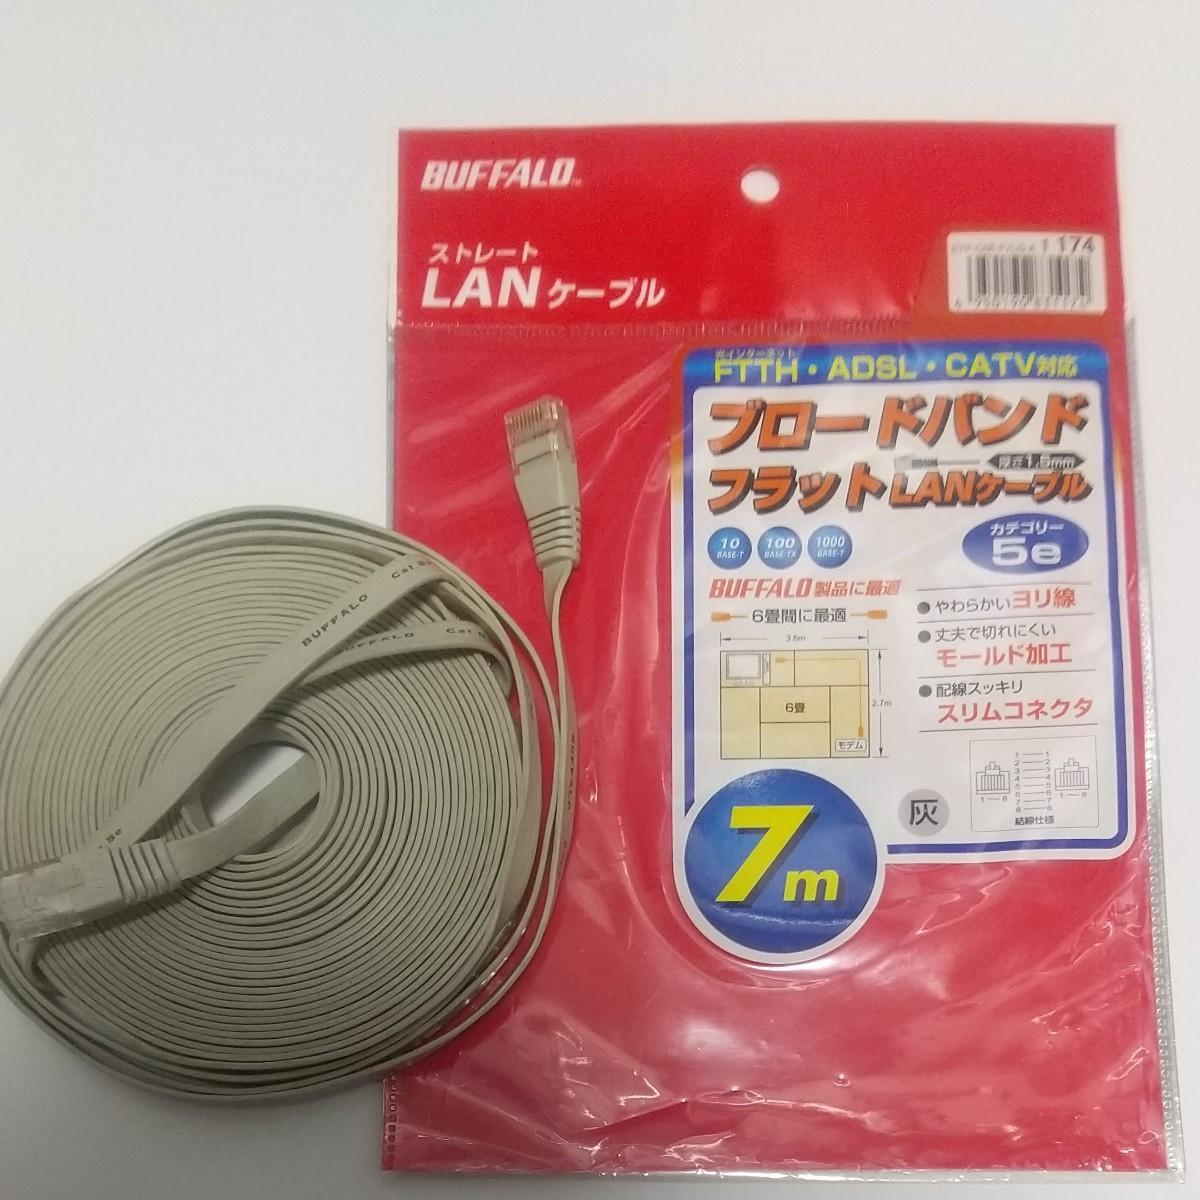 LANケーブル 7m カテゴリー5e 厚さ1.5mm